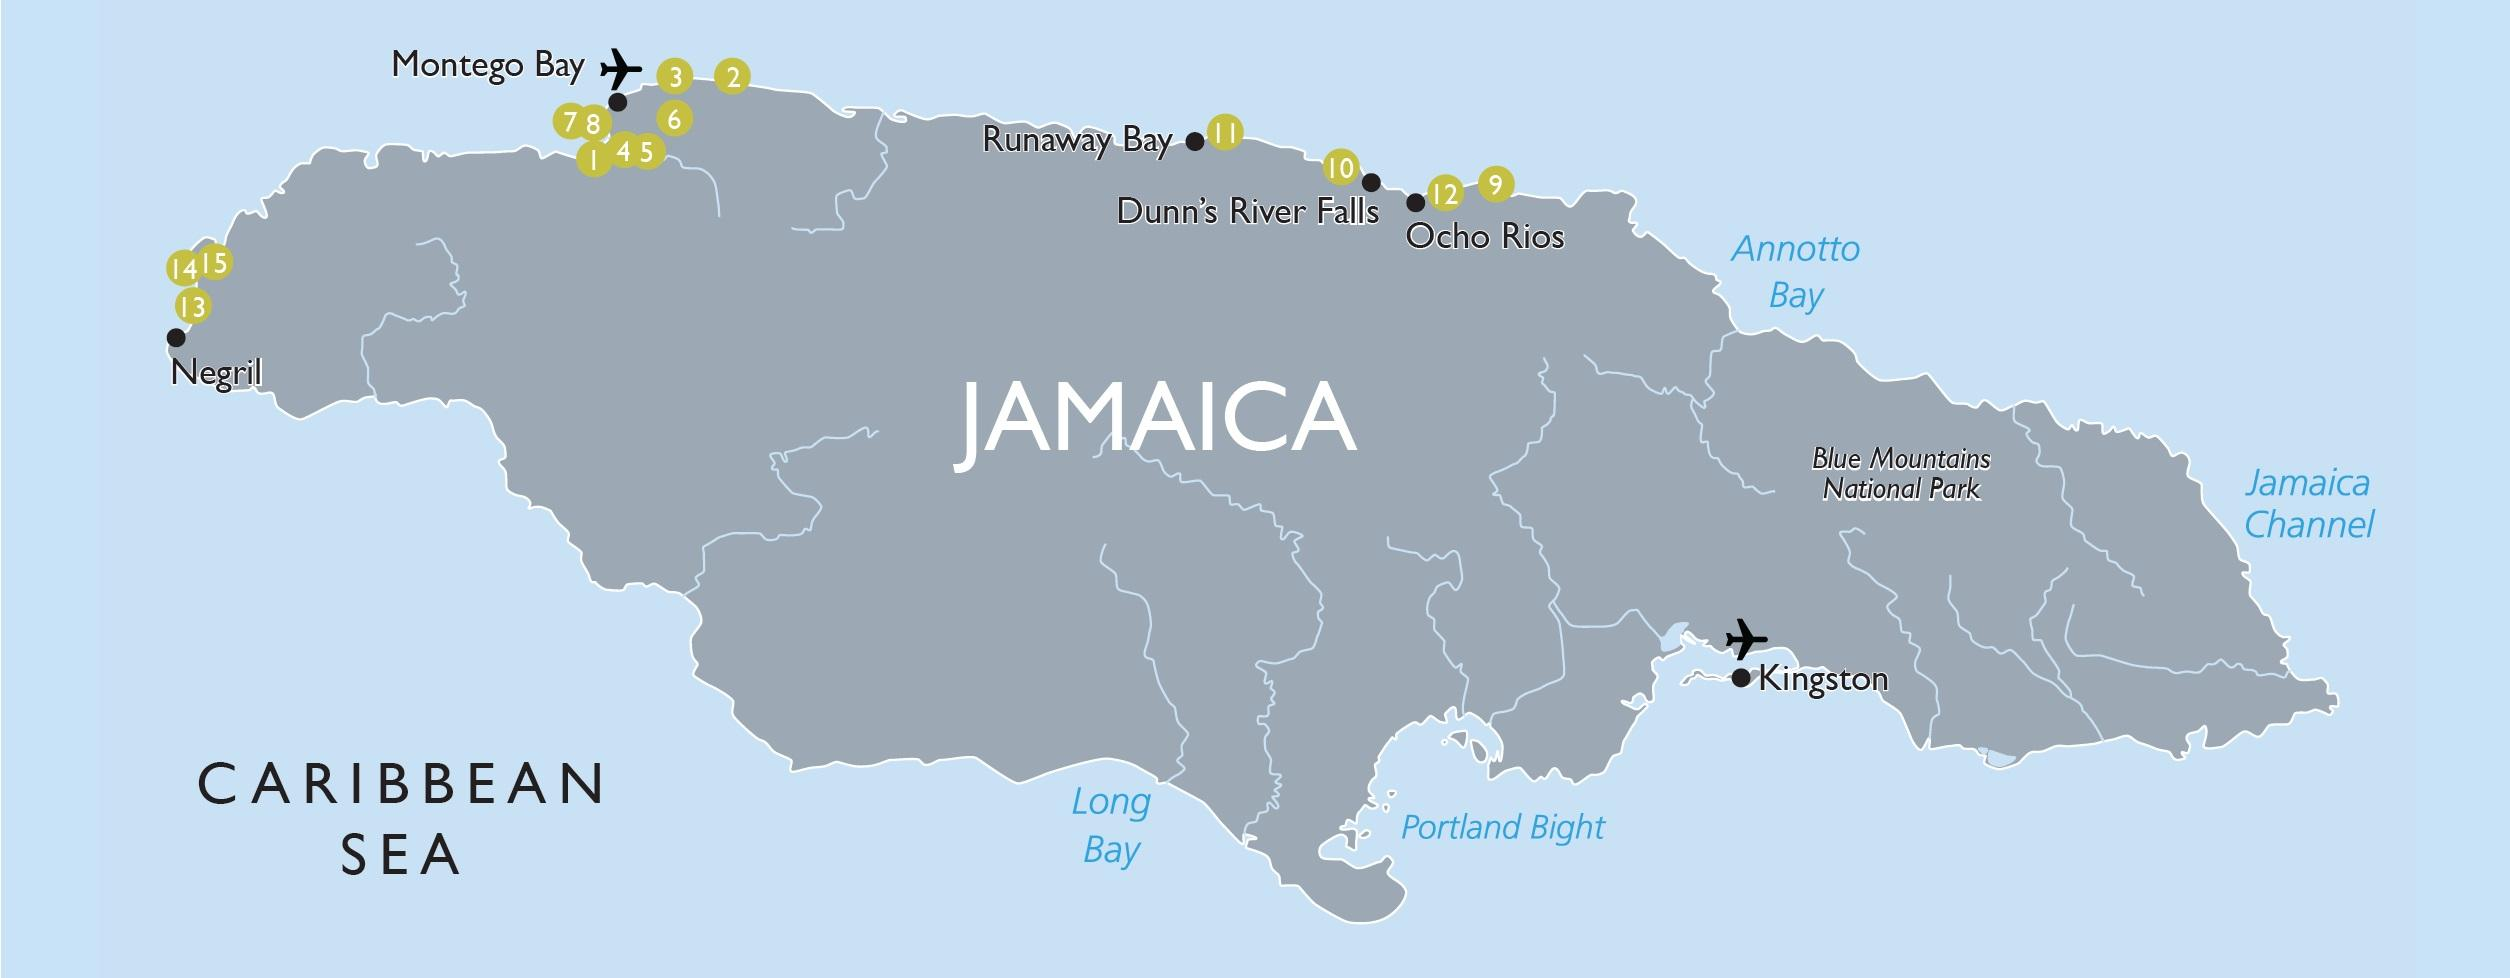 jamaica karta Jamaica tourist map   Karta med sevärdheter i jamaica (Västindien  jamaica karta